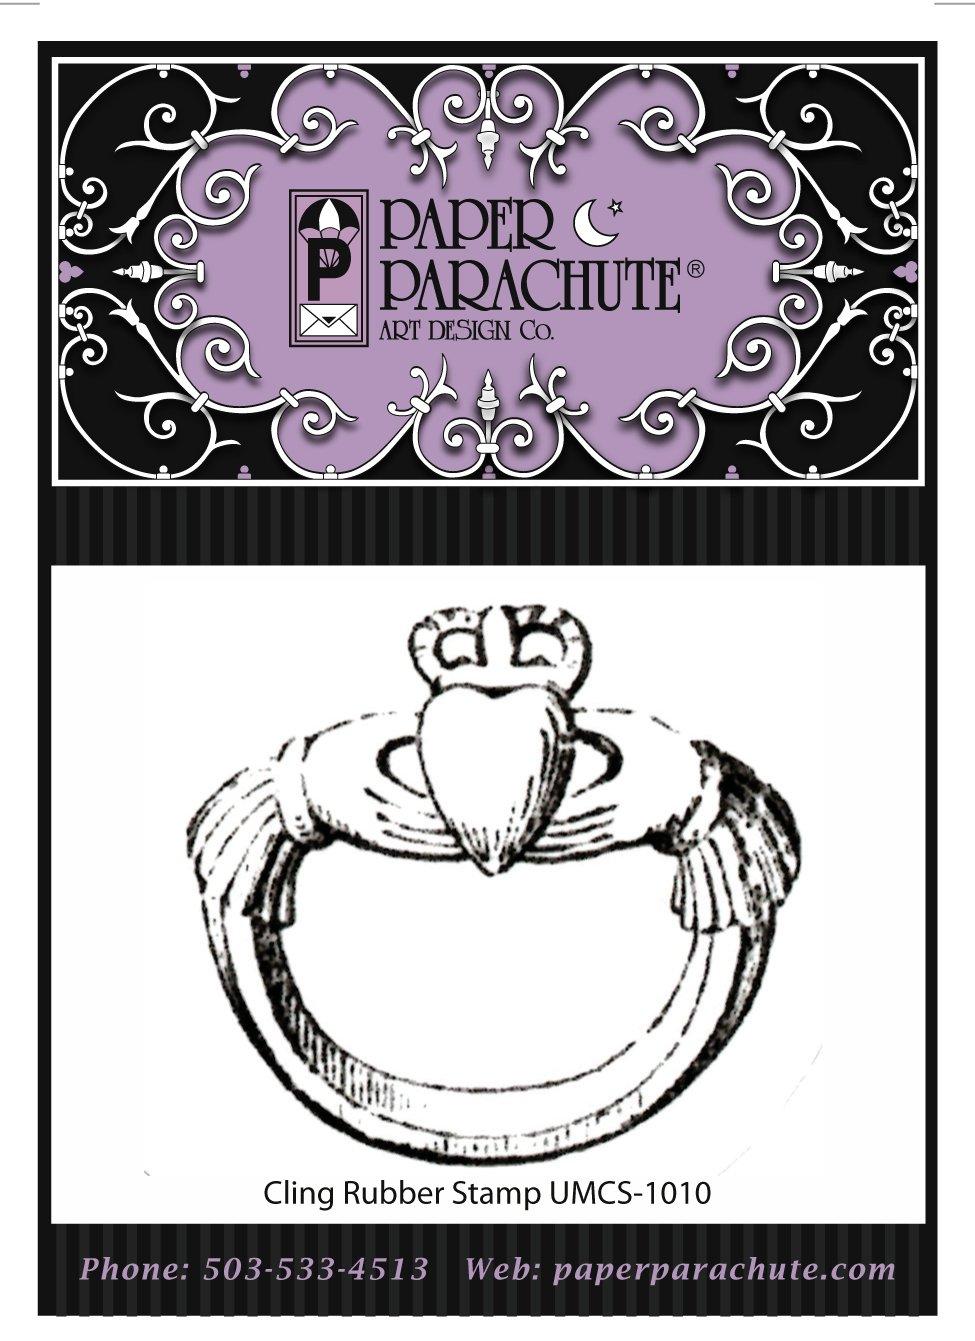 Paper Parachute Rubber Stamp - UMCS1010